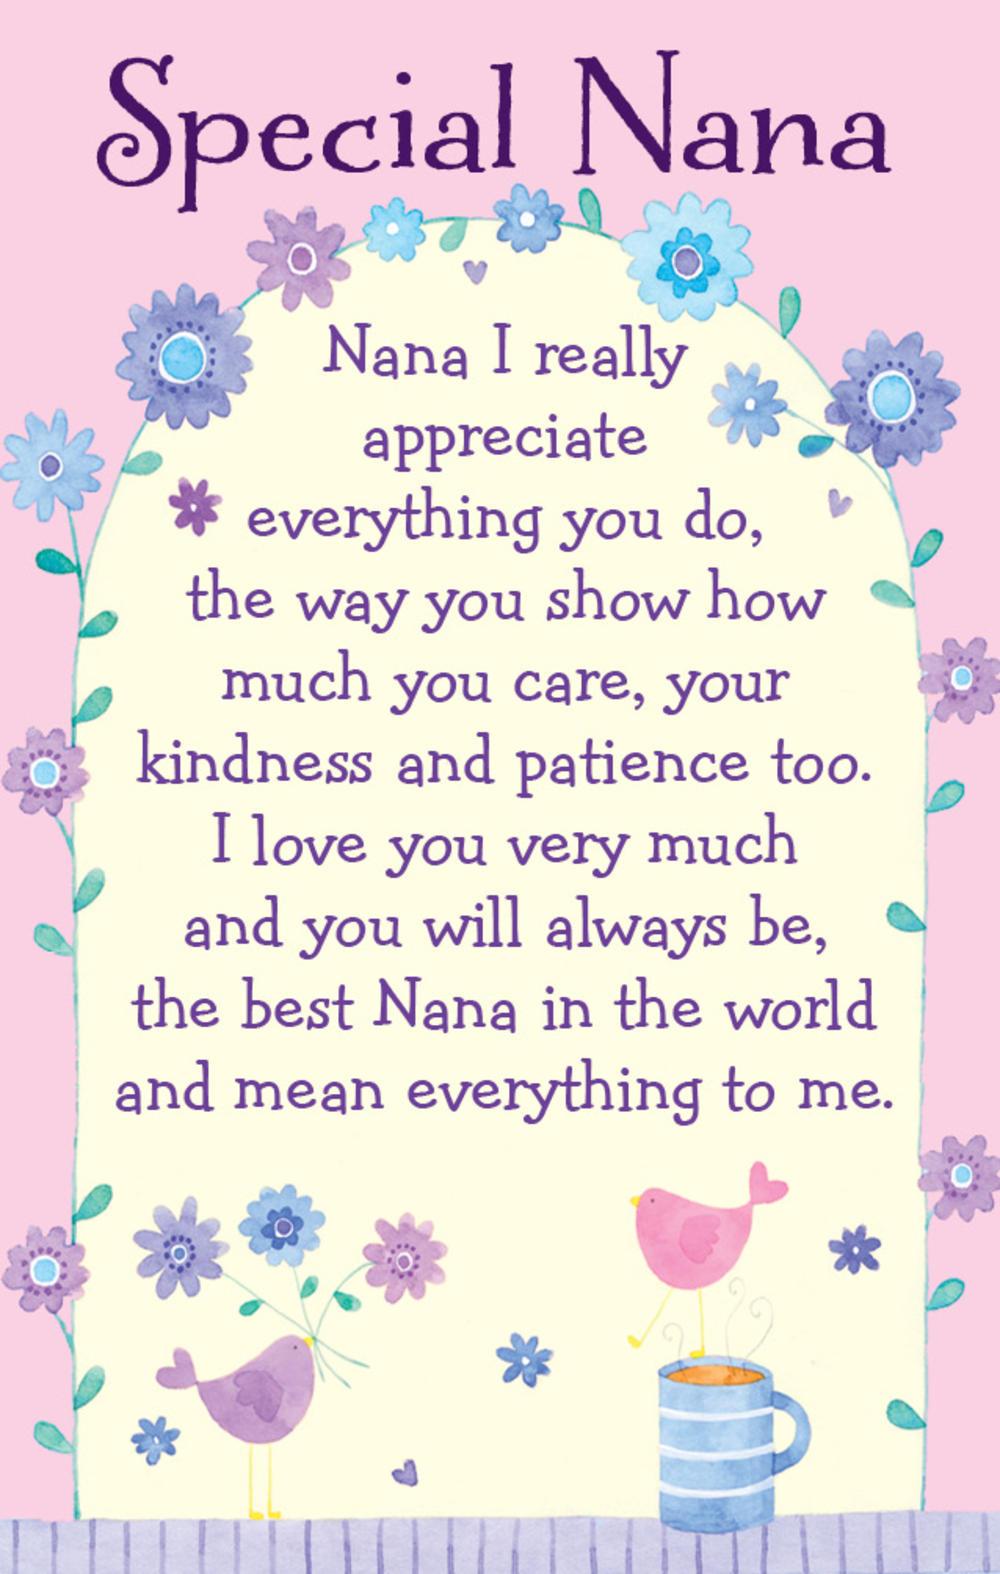 Special Nana Heartwarmers Keepsake Credit Card & Envelope